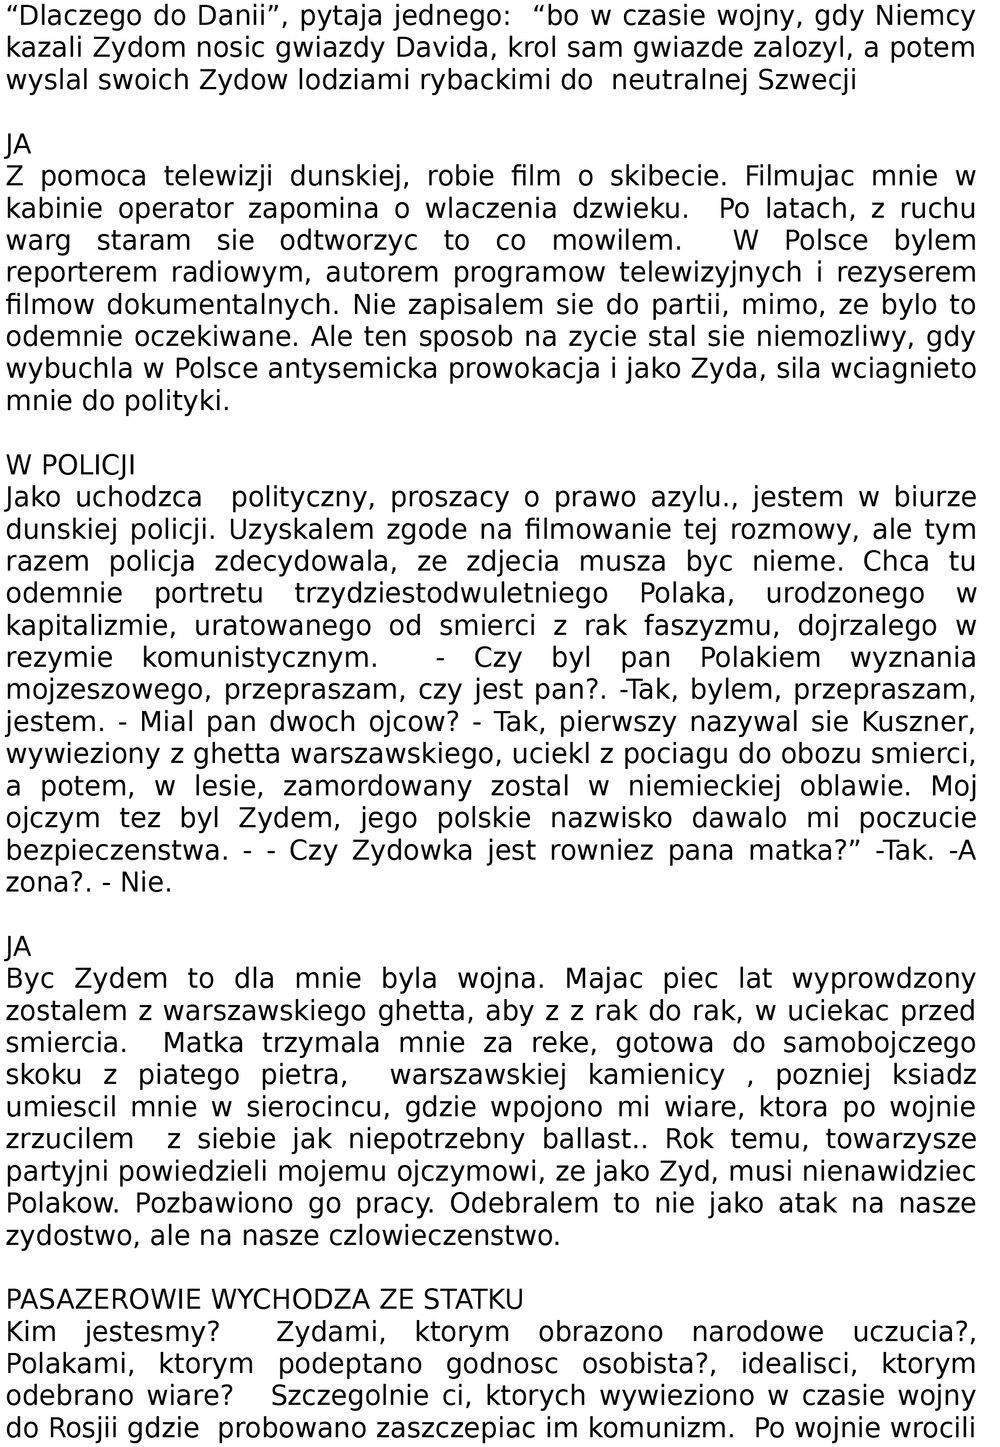 SKIBET-WERSJA-POLSKA-2.jpg